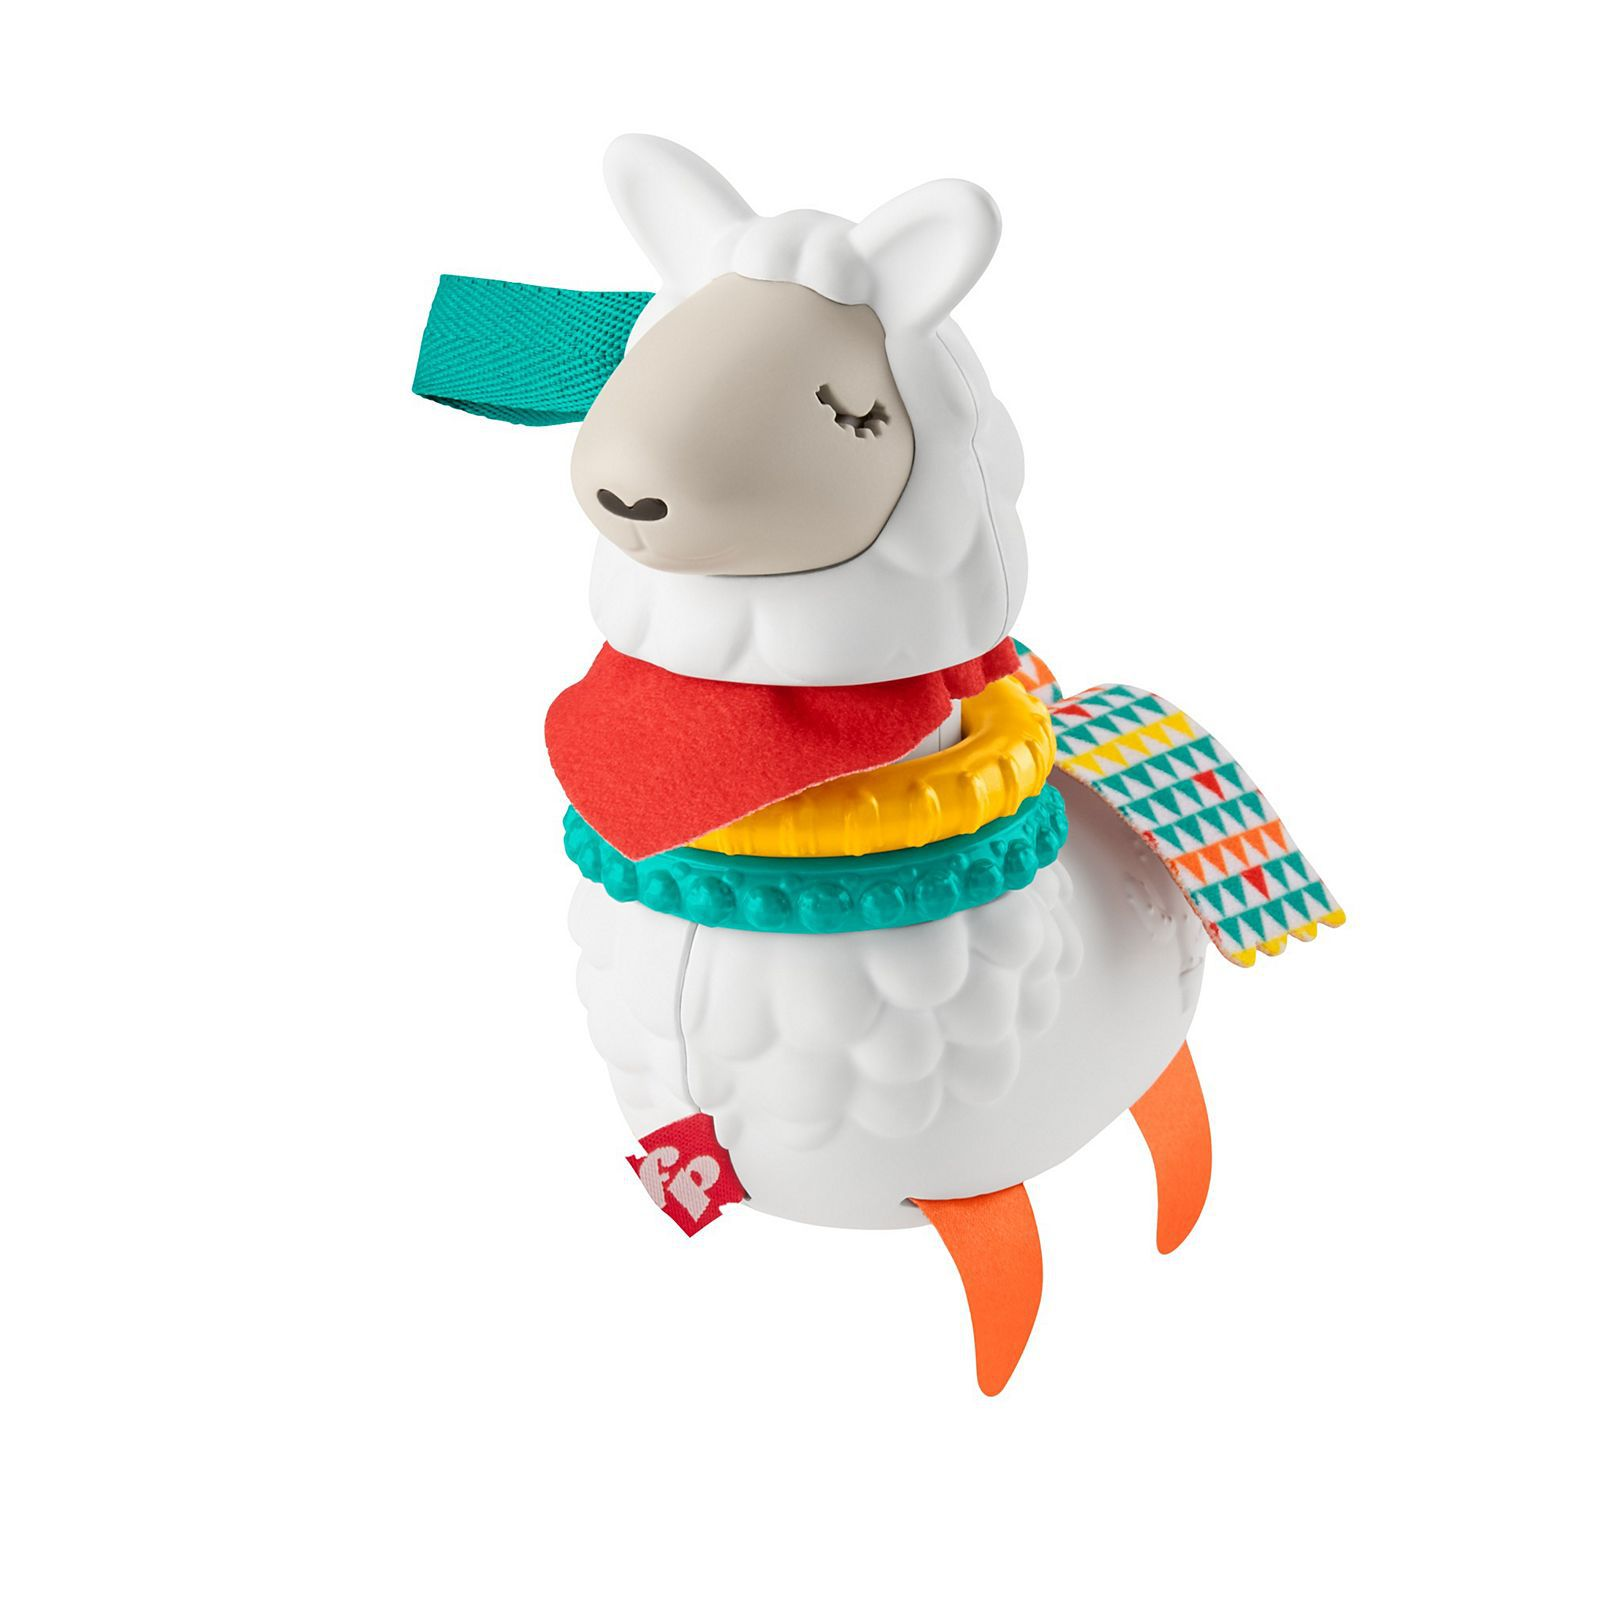 Fisher Price Chocalho Lhama Divertida  FXC20 Mattel